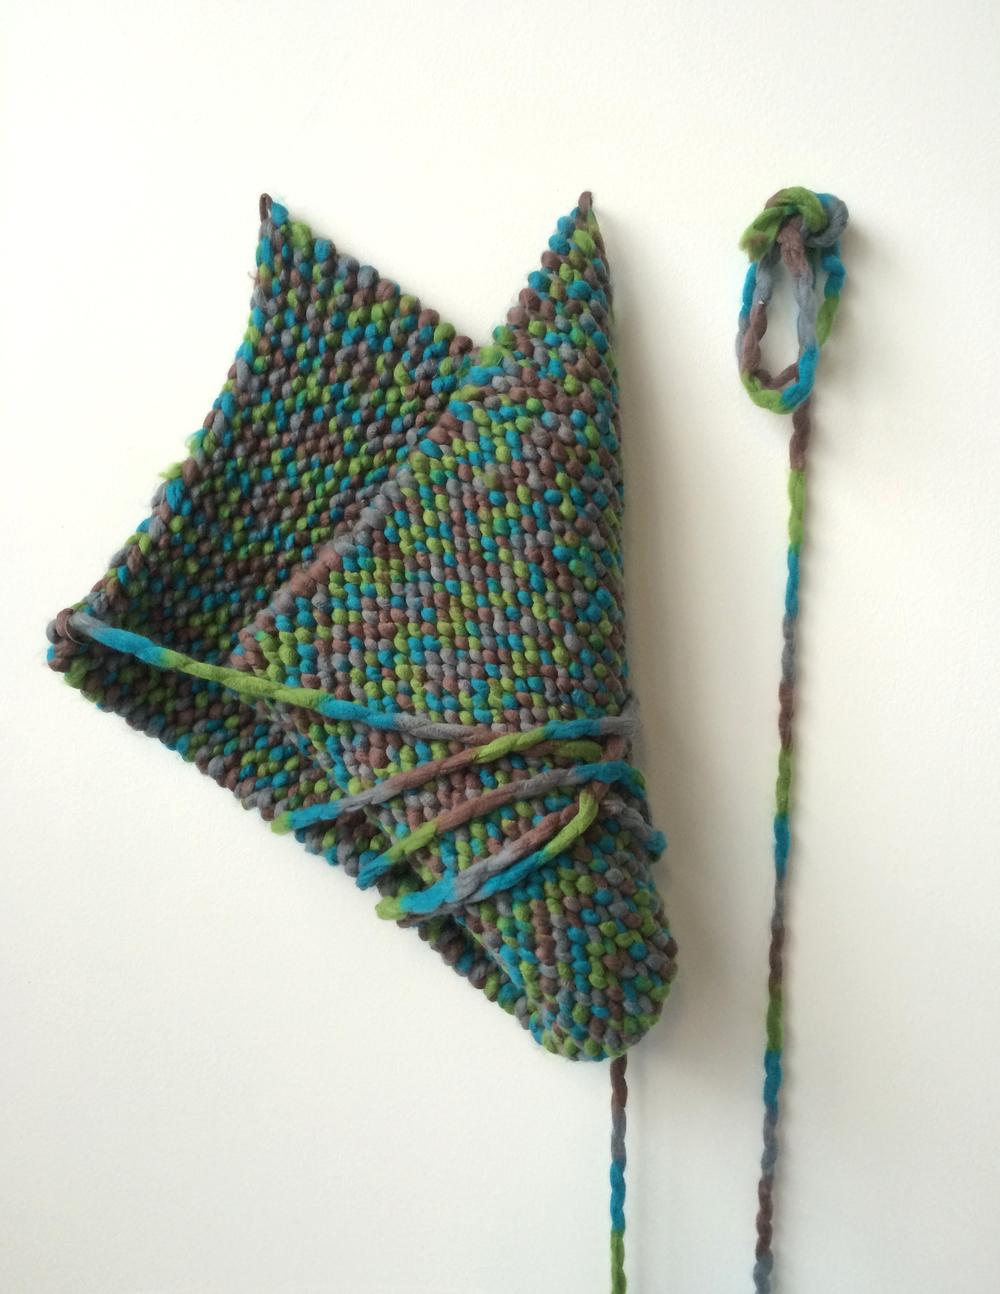 Maude Findlay | 2015 | hand knitted acrylic yarn | 40 x 15